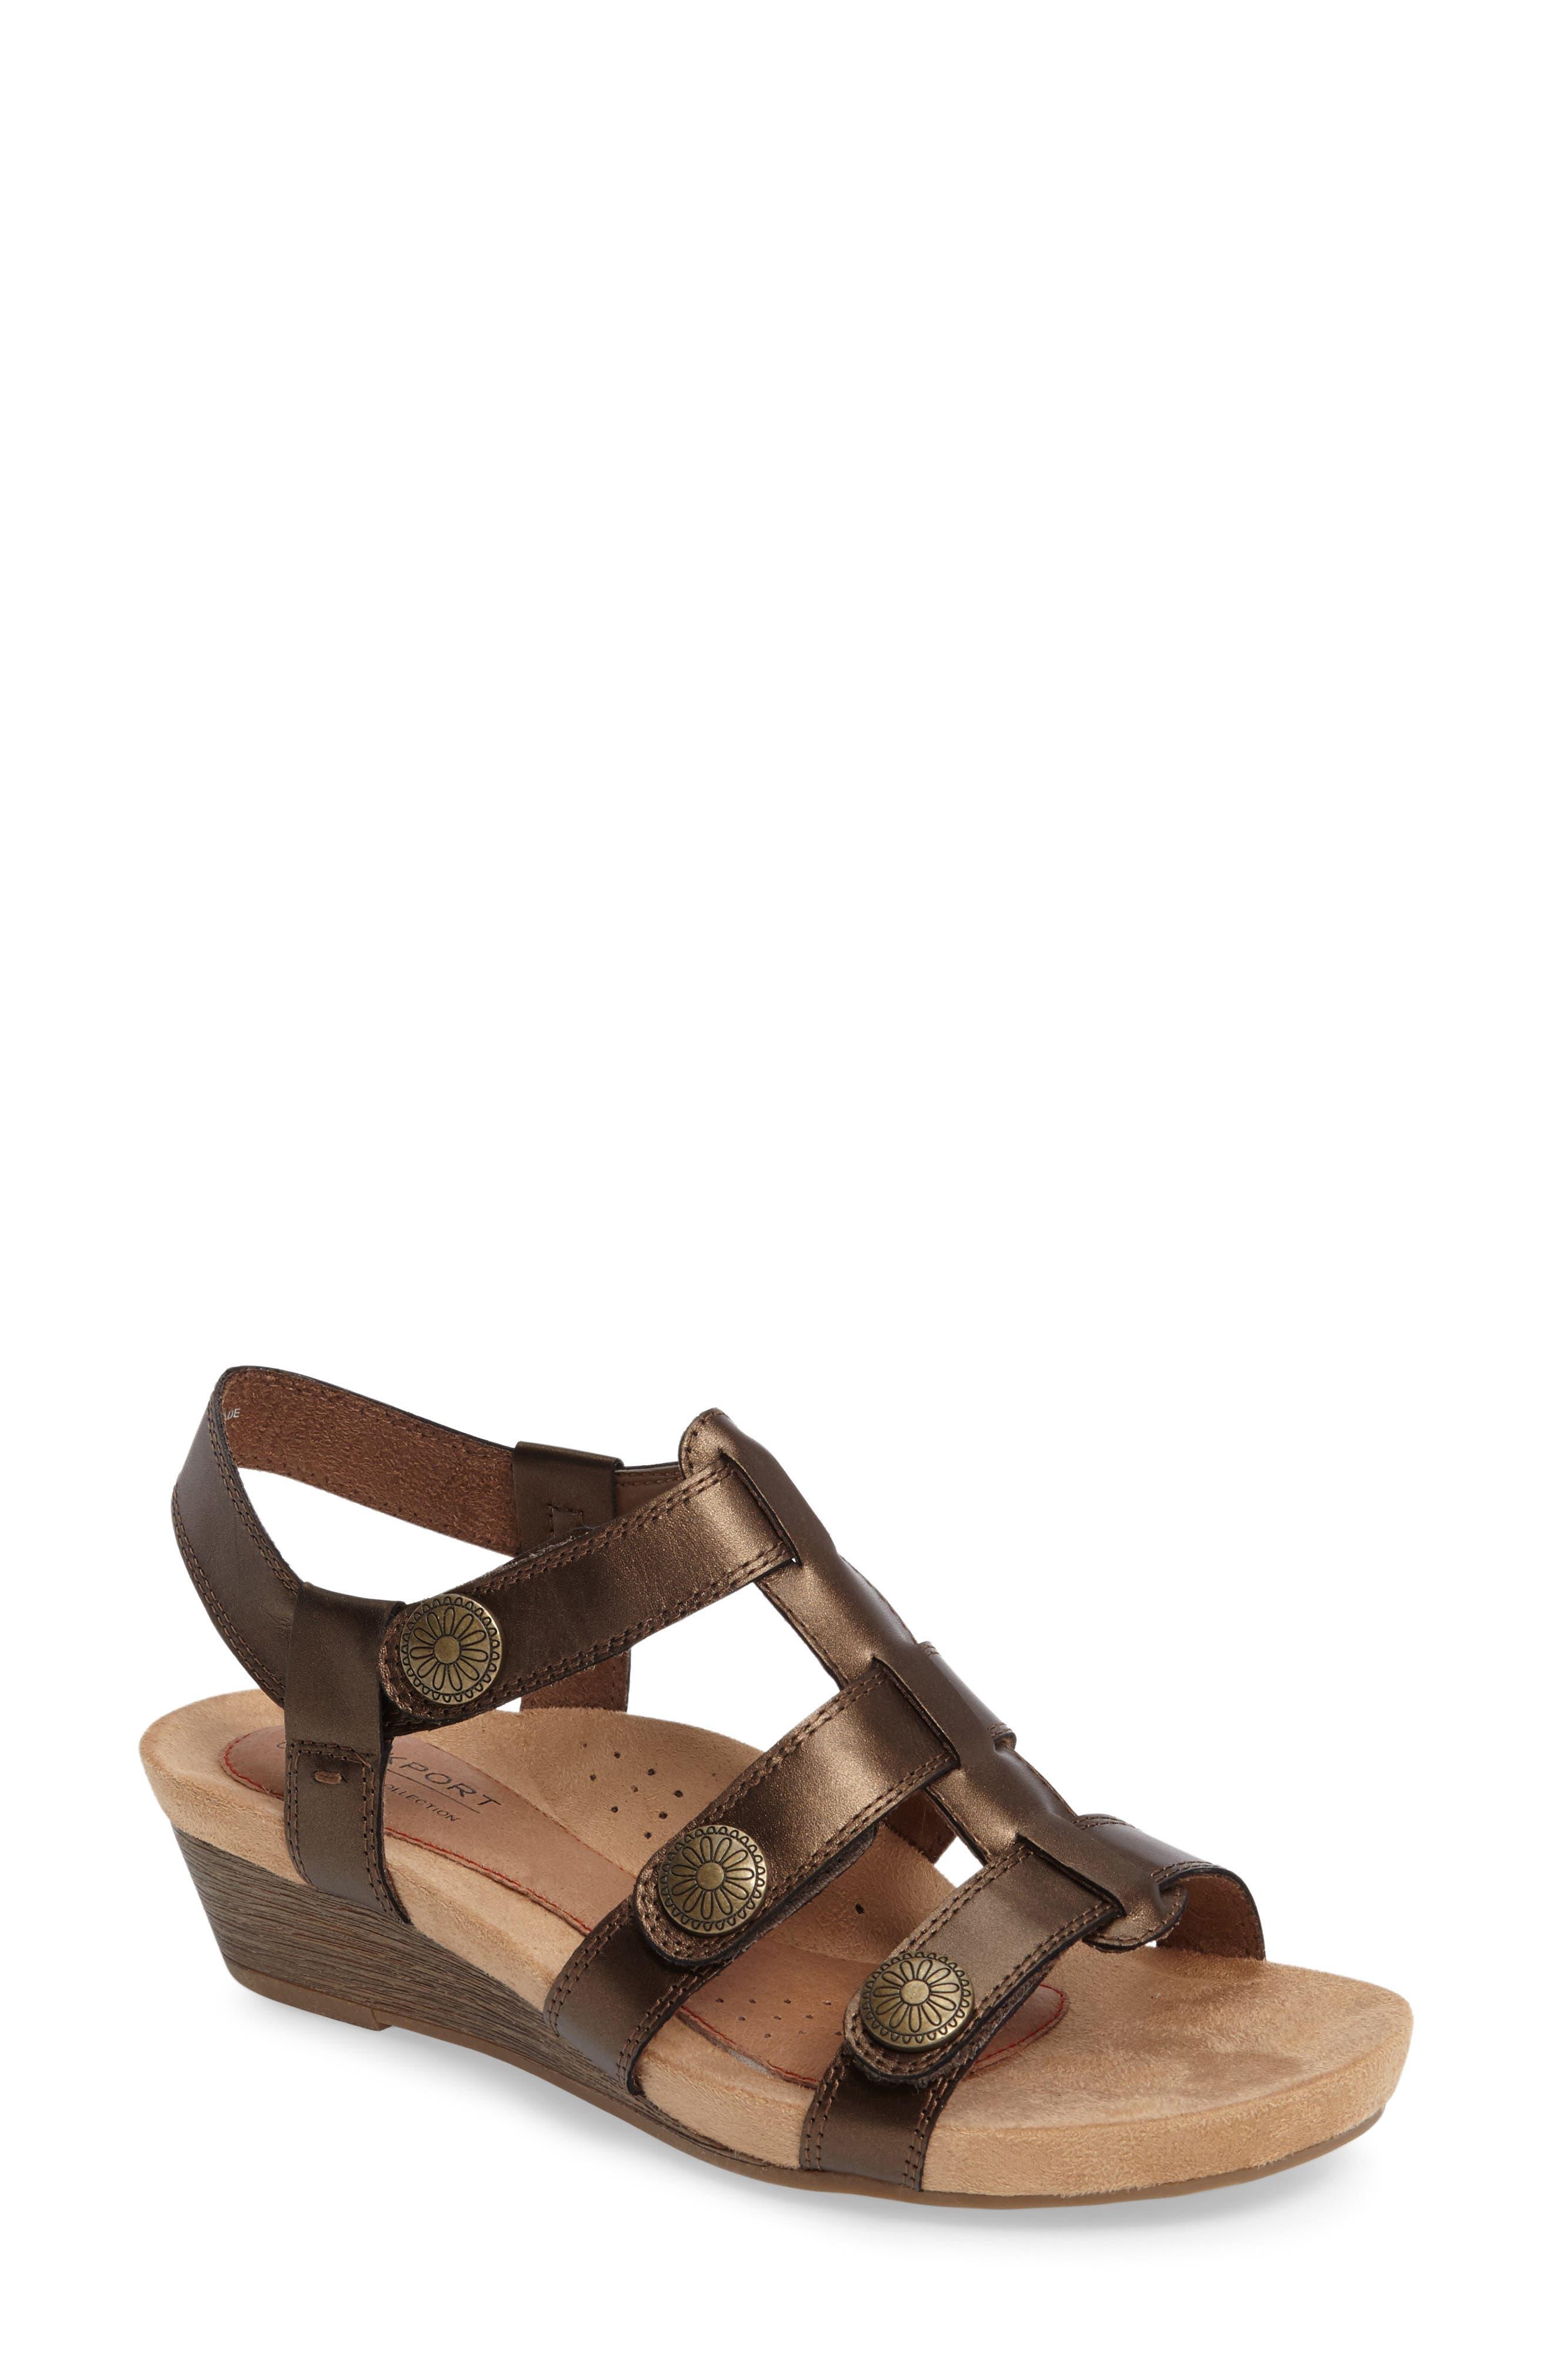 'Harper' Wedge Sandal,                             Main thumbnail 1, color,                             Bronze Leather